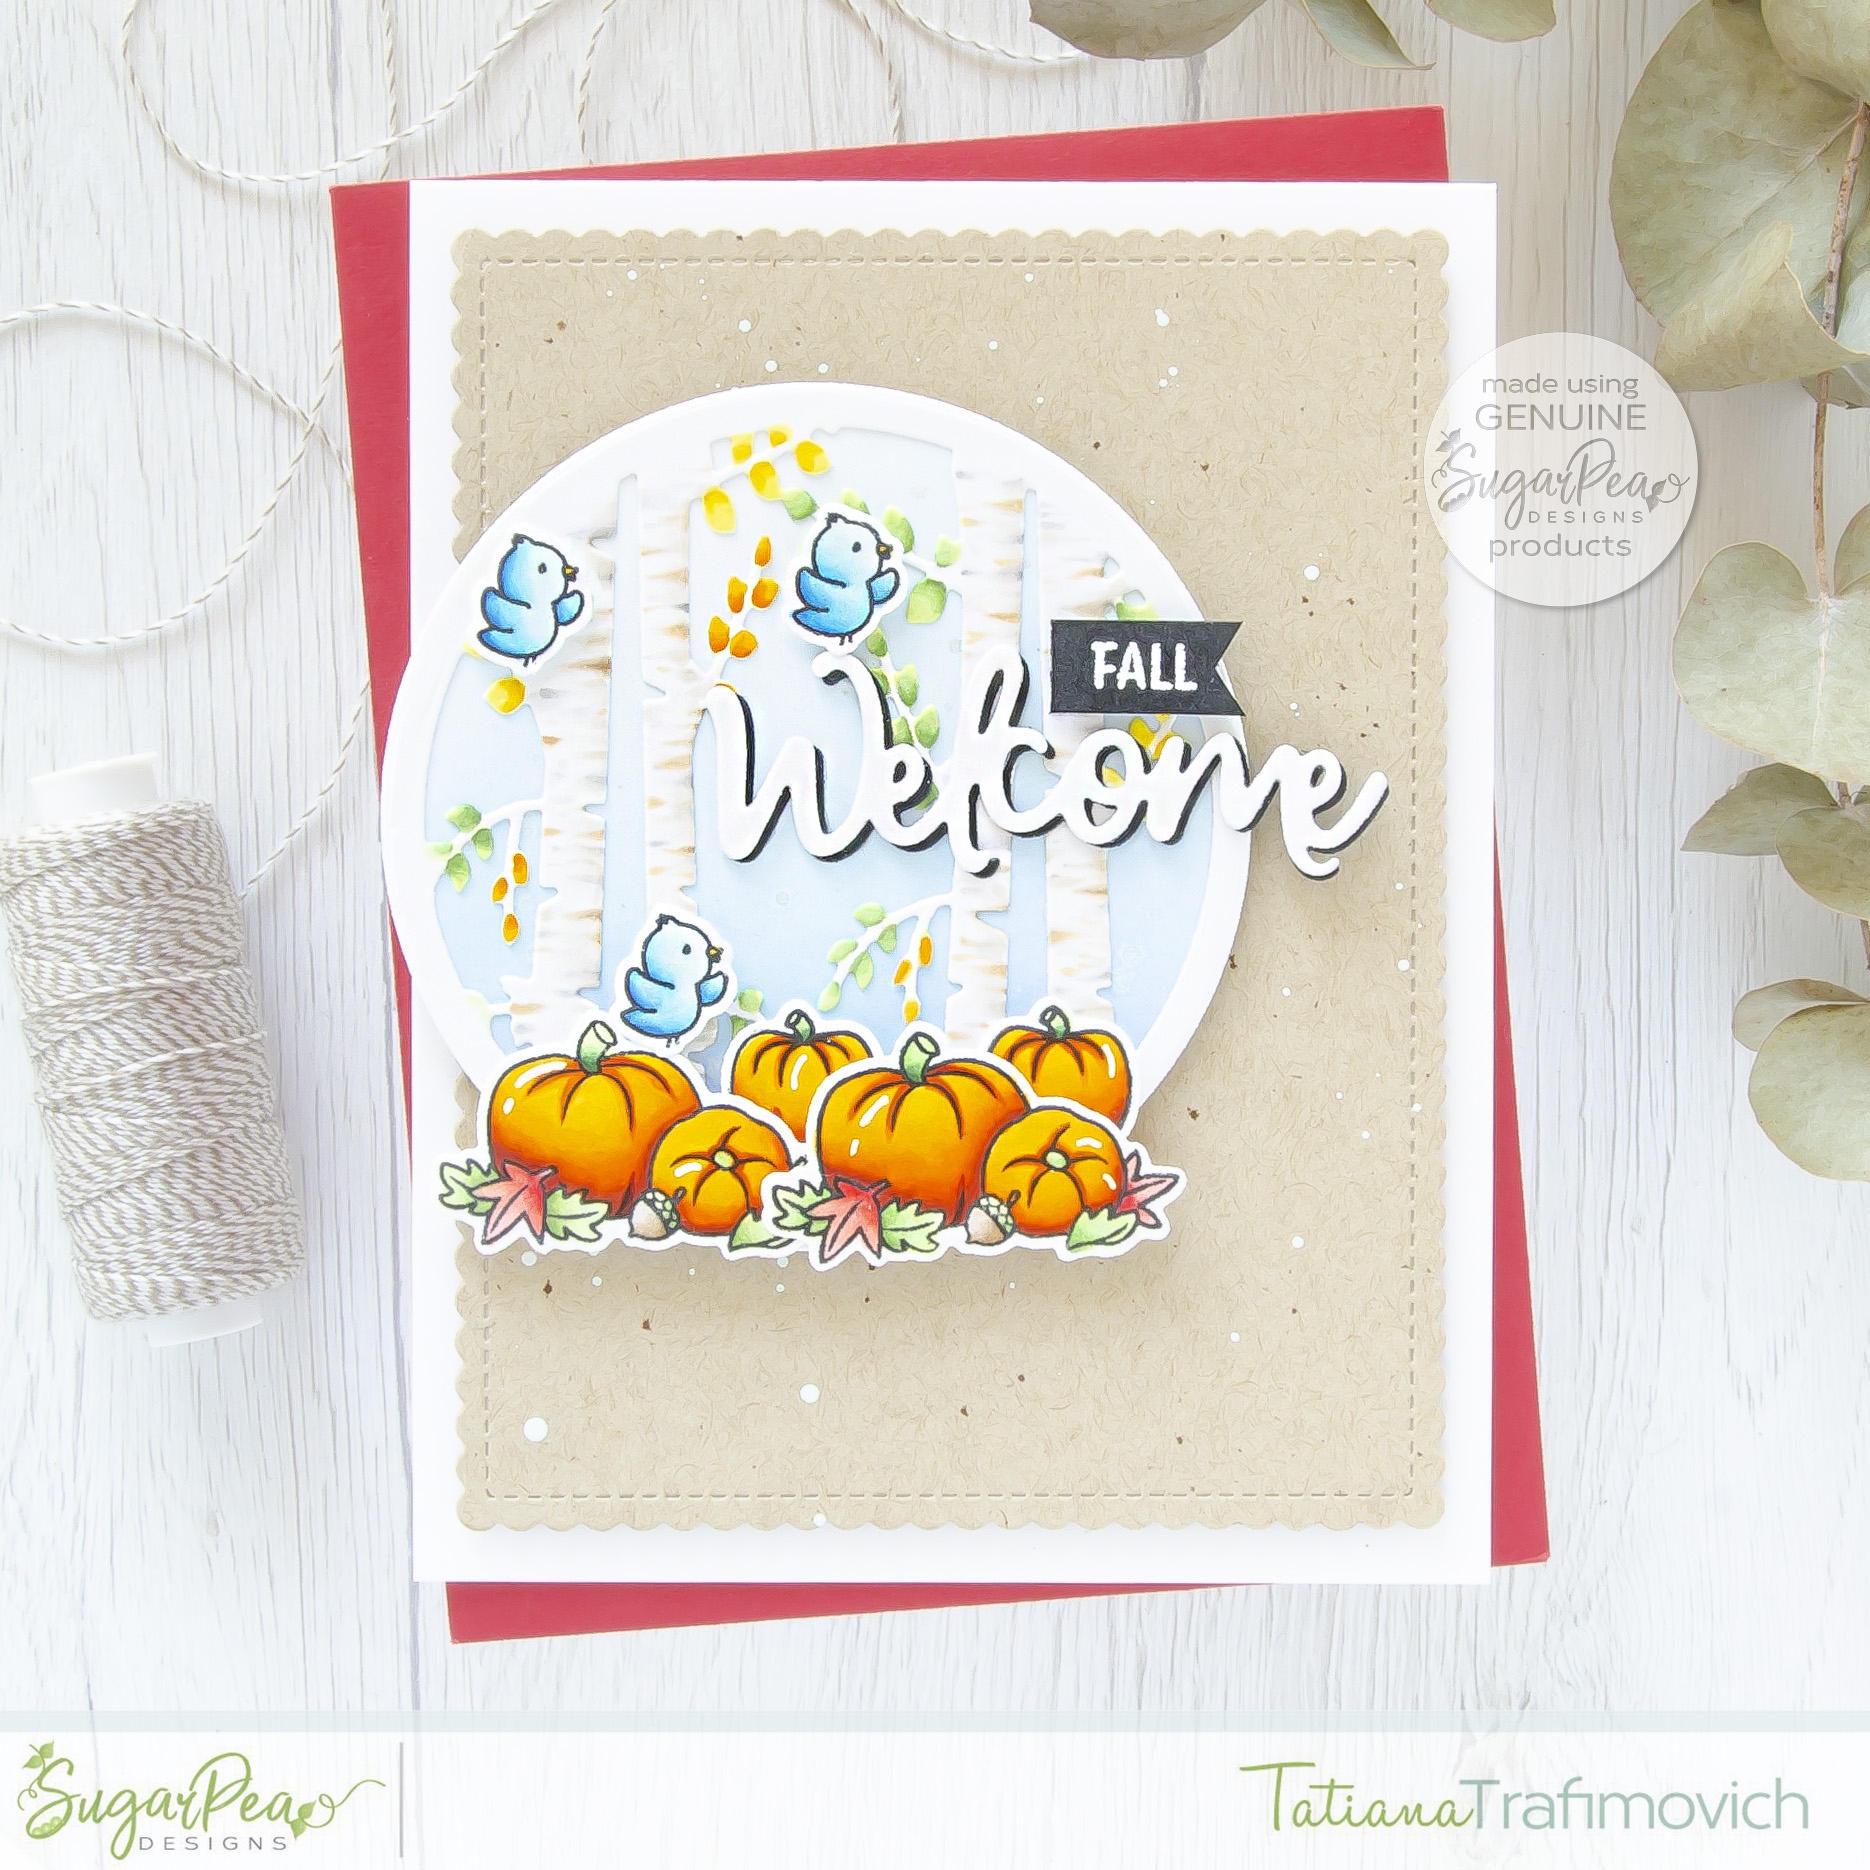 Welcome Fall #handmade card by Tatiana Trafimovich #tatianacraftandart - Birch Forest SugarCut by SugarPea Designs #sugarpeadesigns